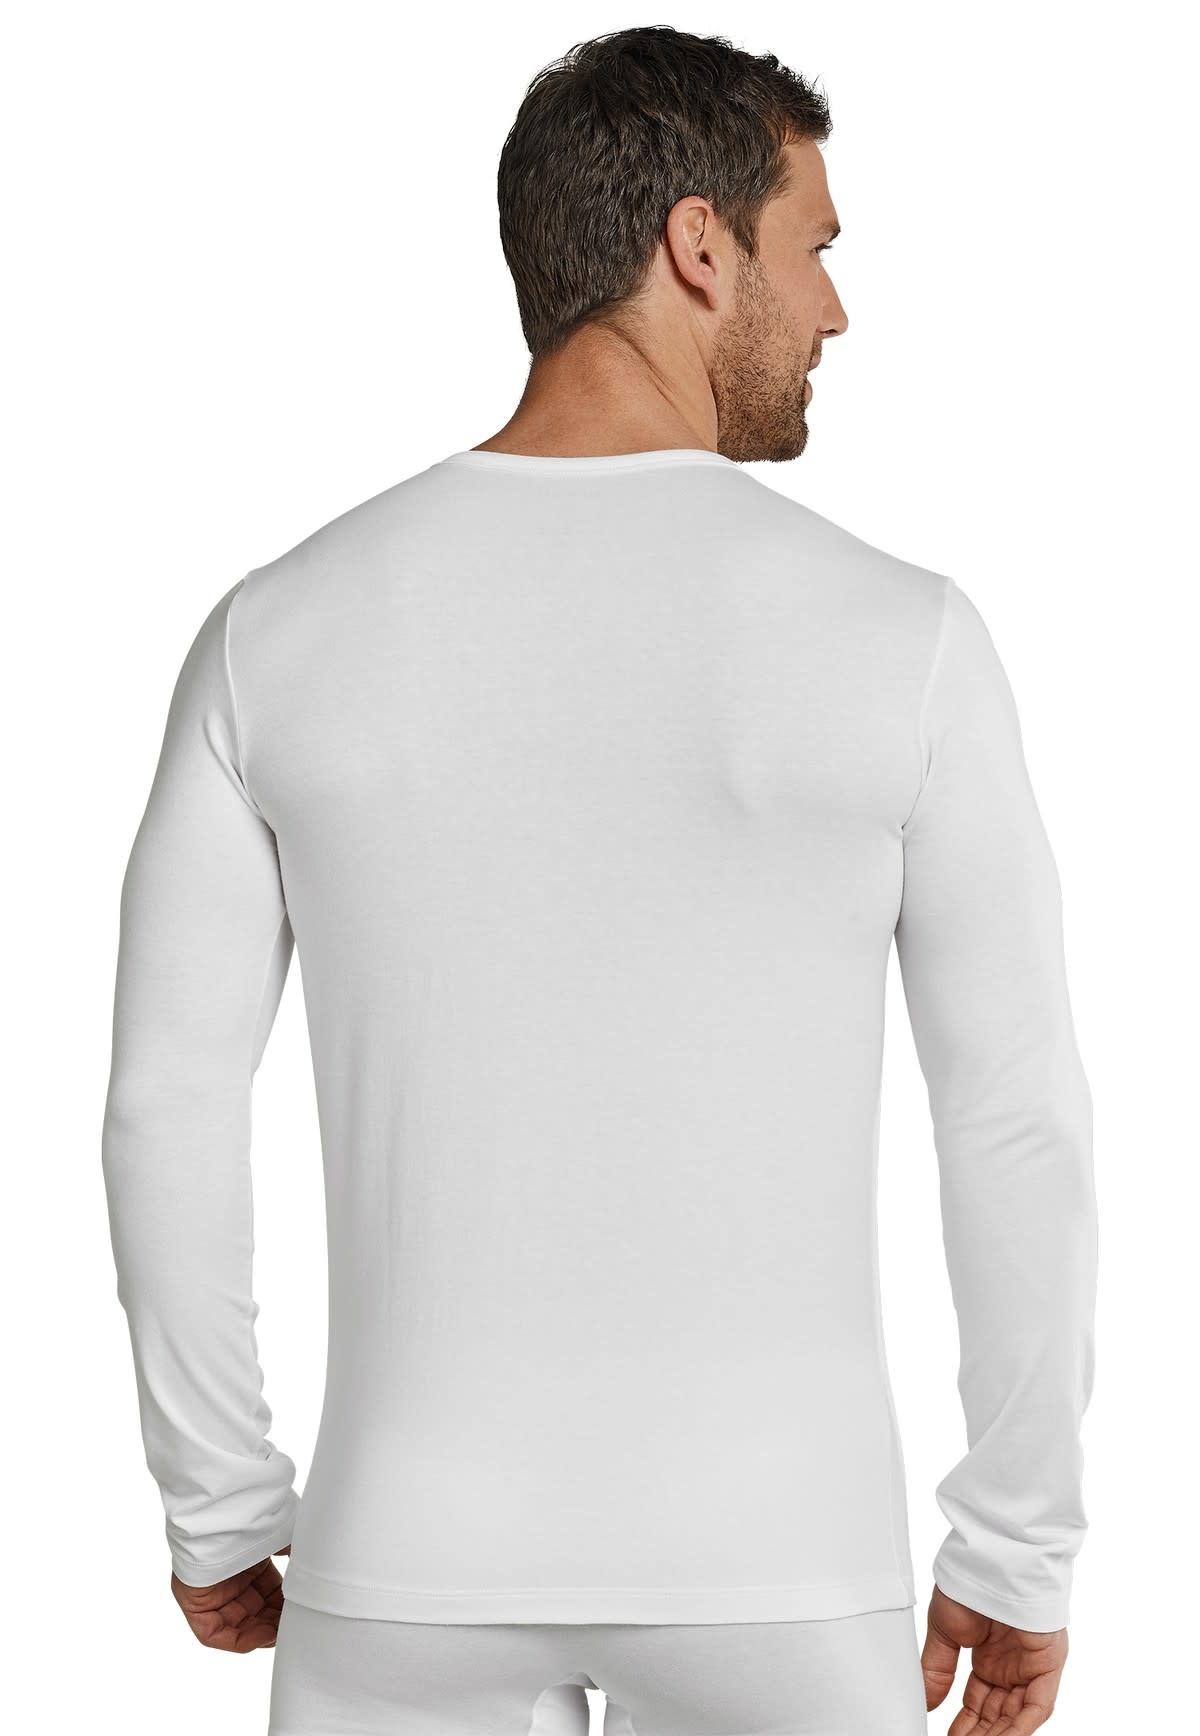 T-shirt lange mouw 95/5 205419 - wit-2